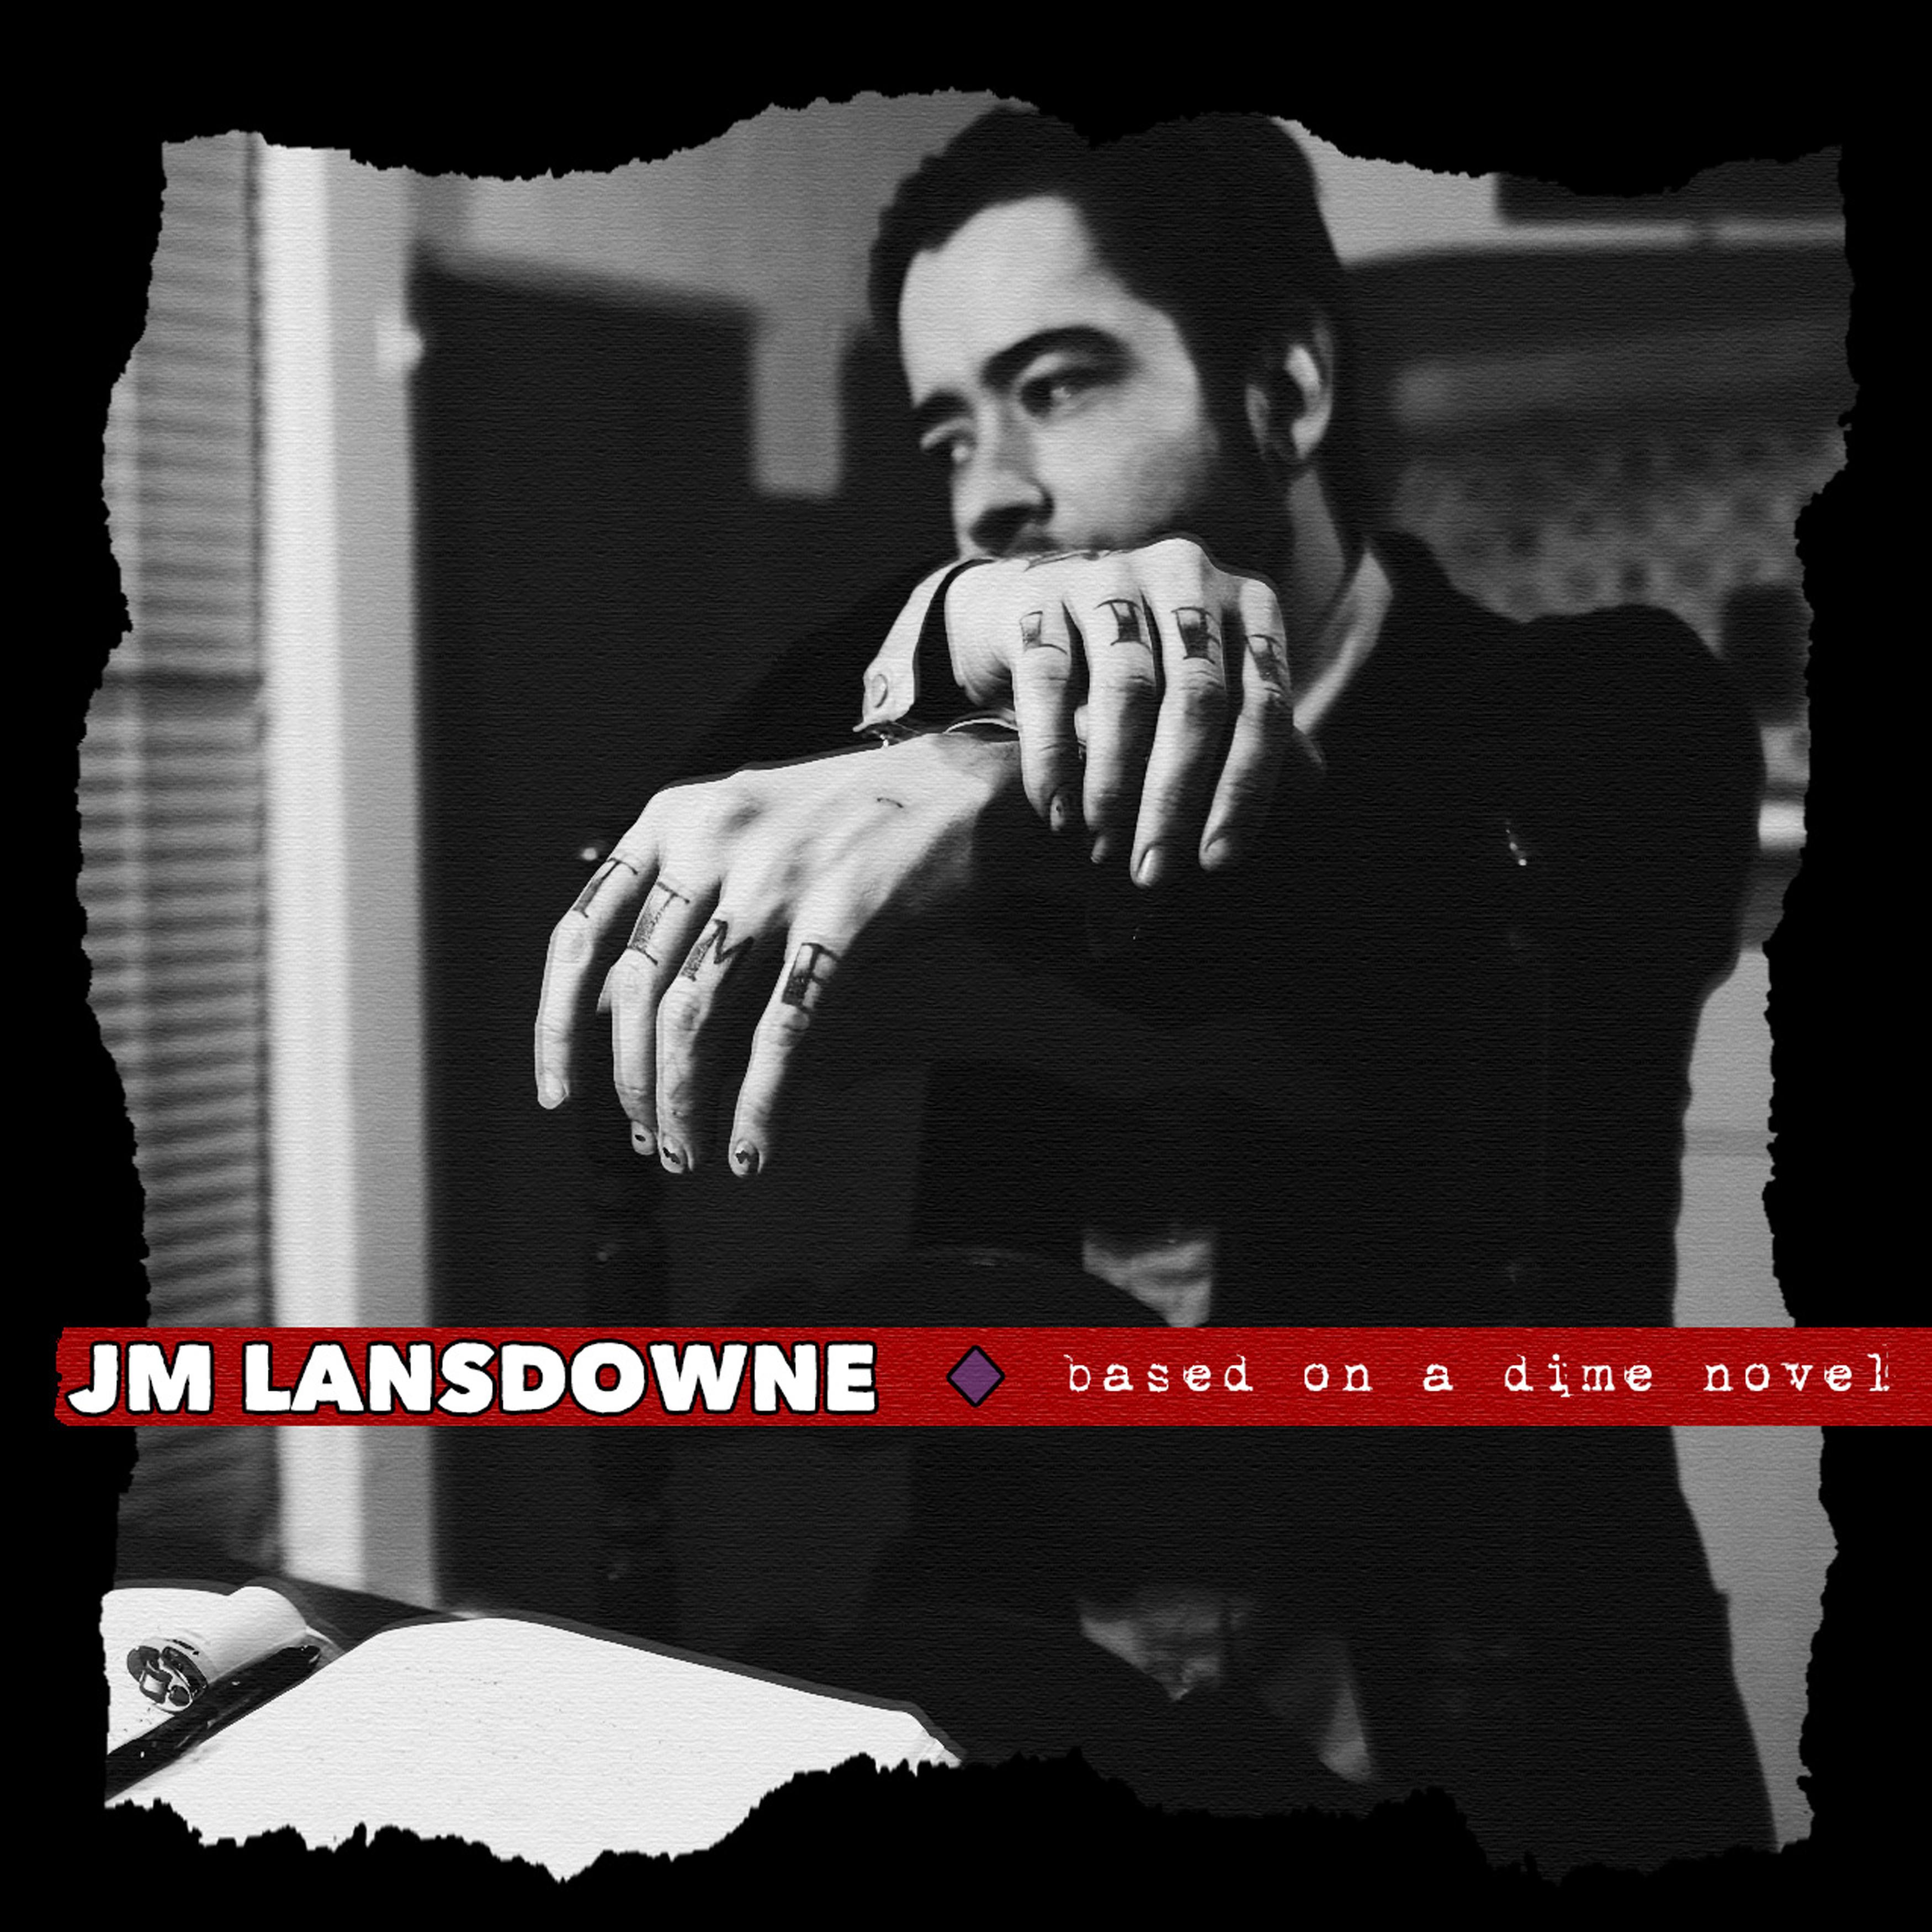 JM Lansdowne